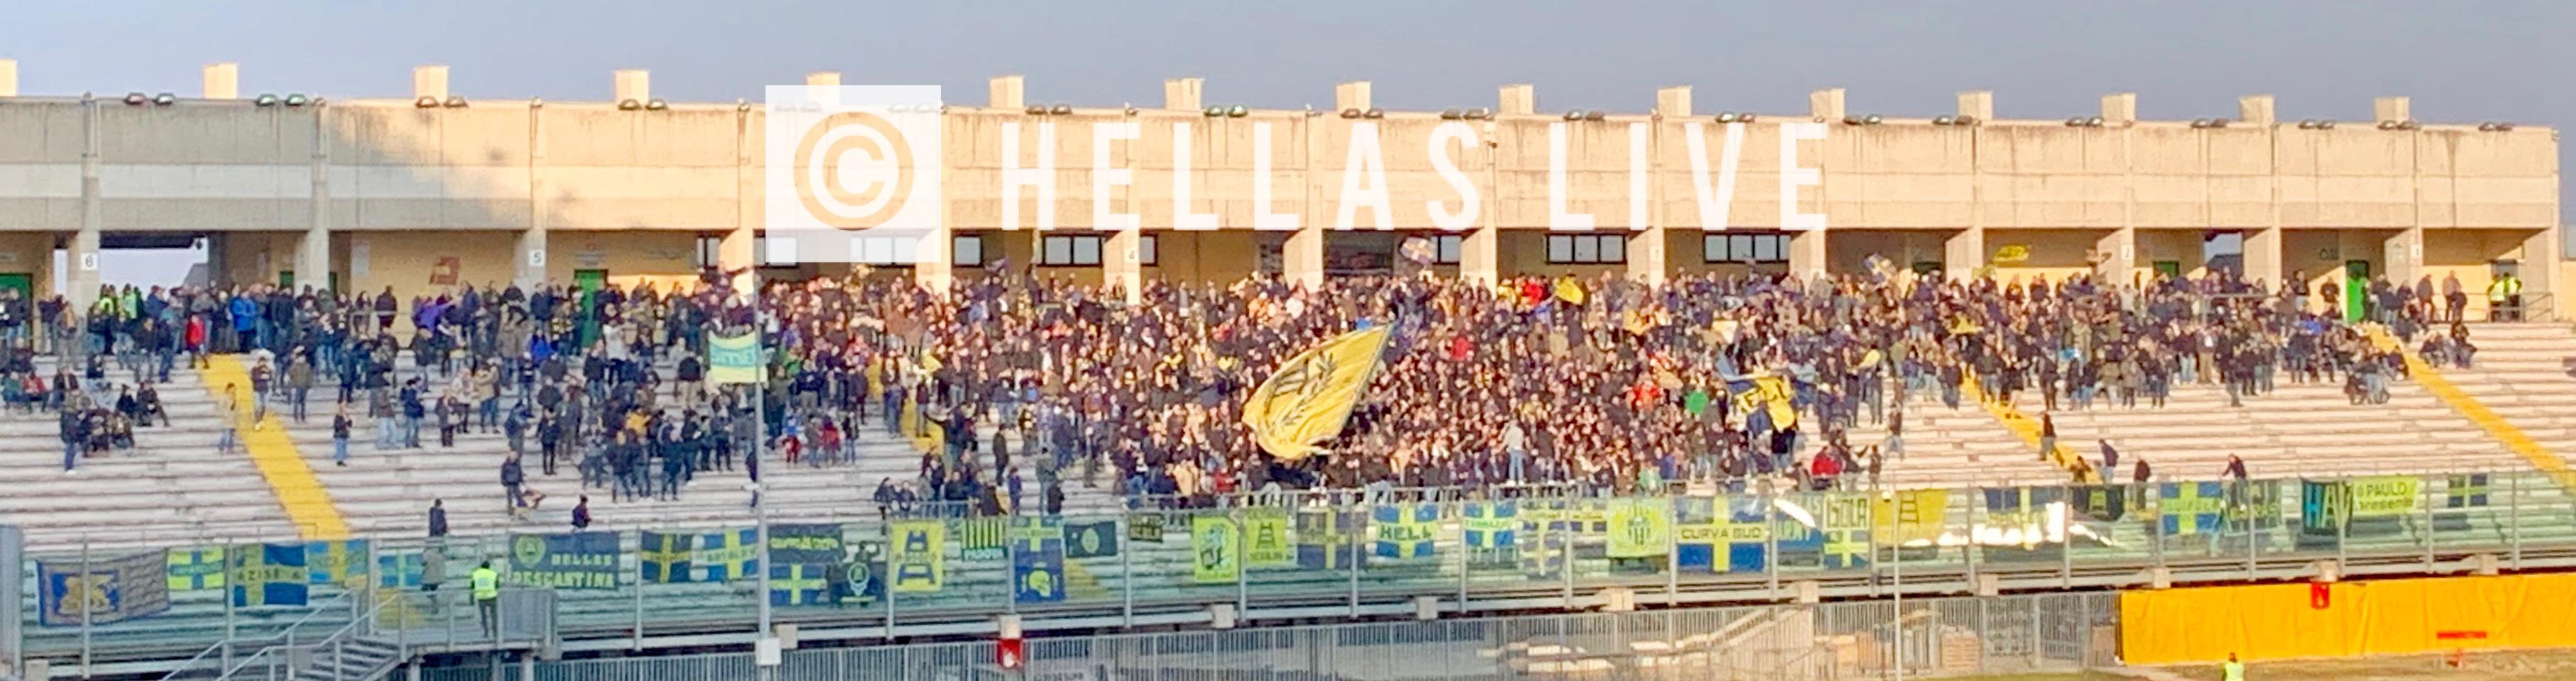 Padova-Hellas Verona, i 1430 tifosi gialloblù presenti ...